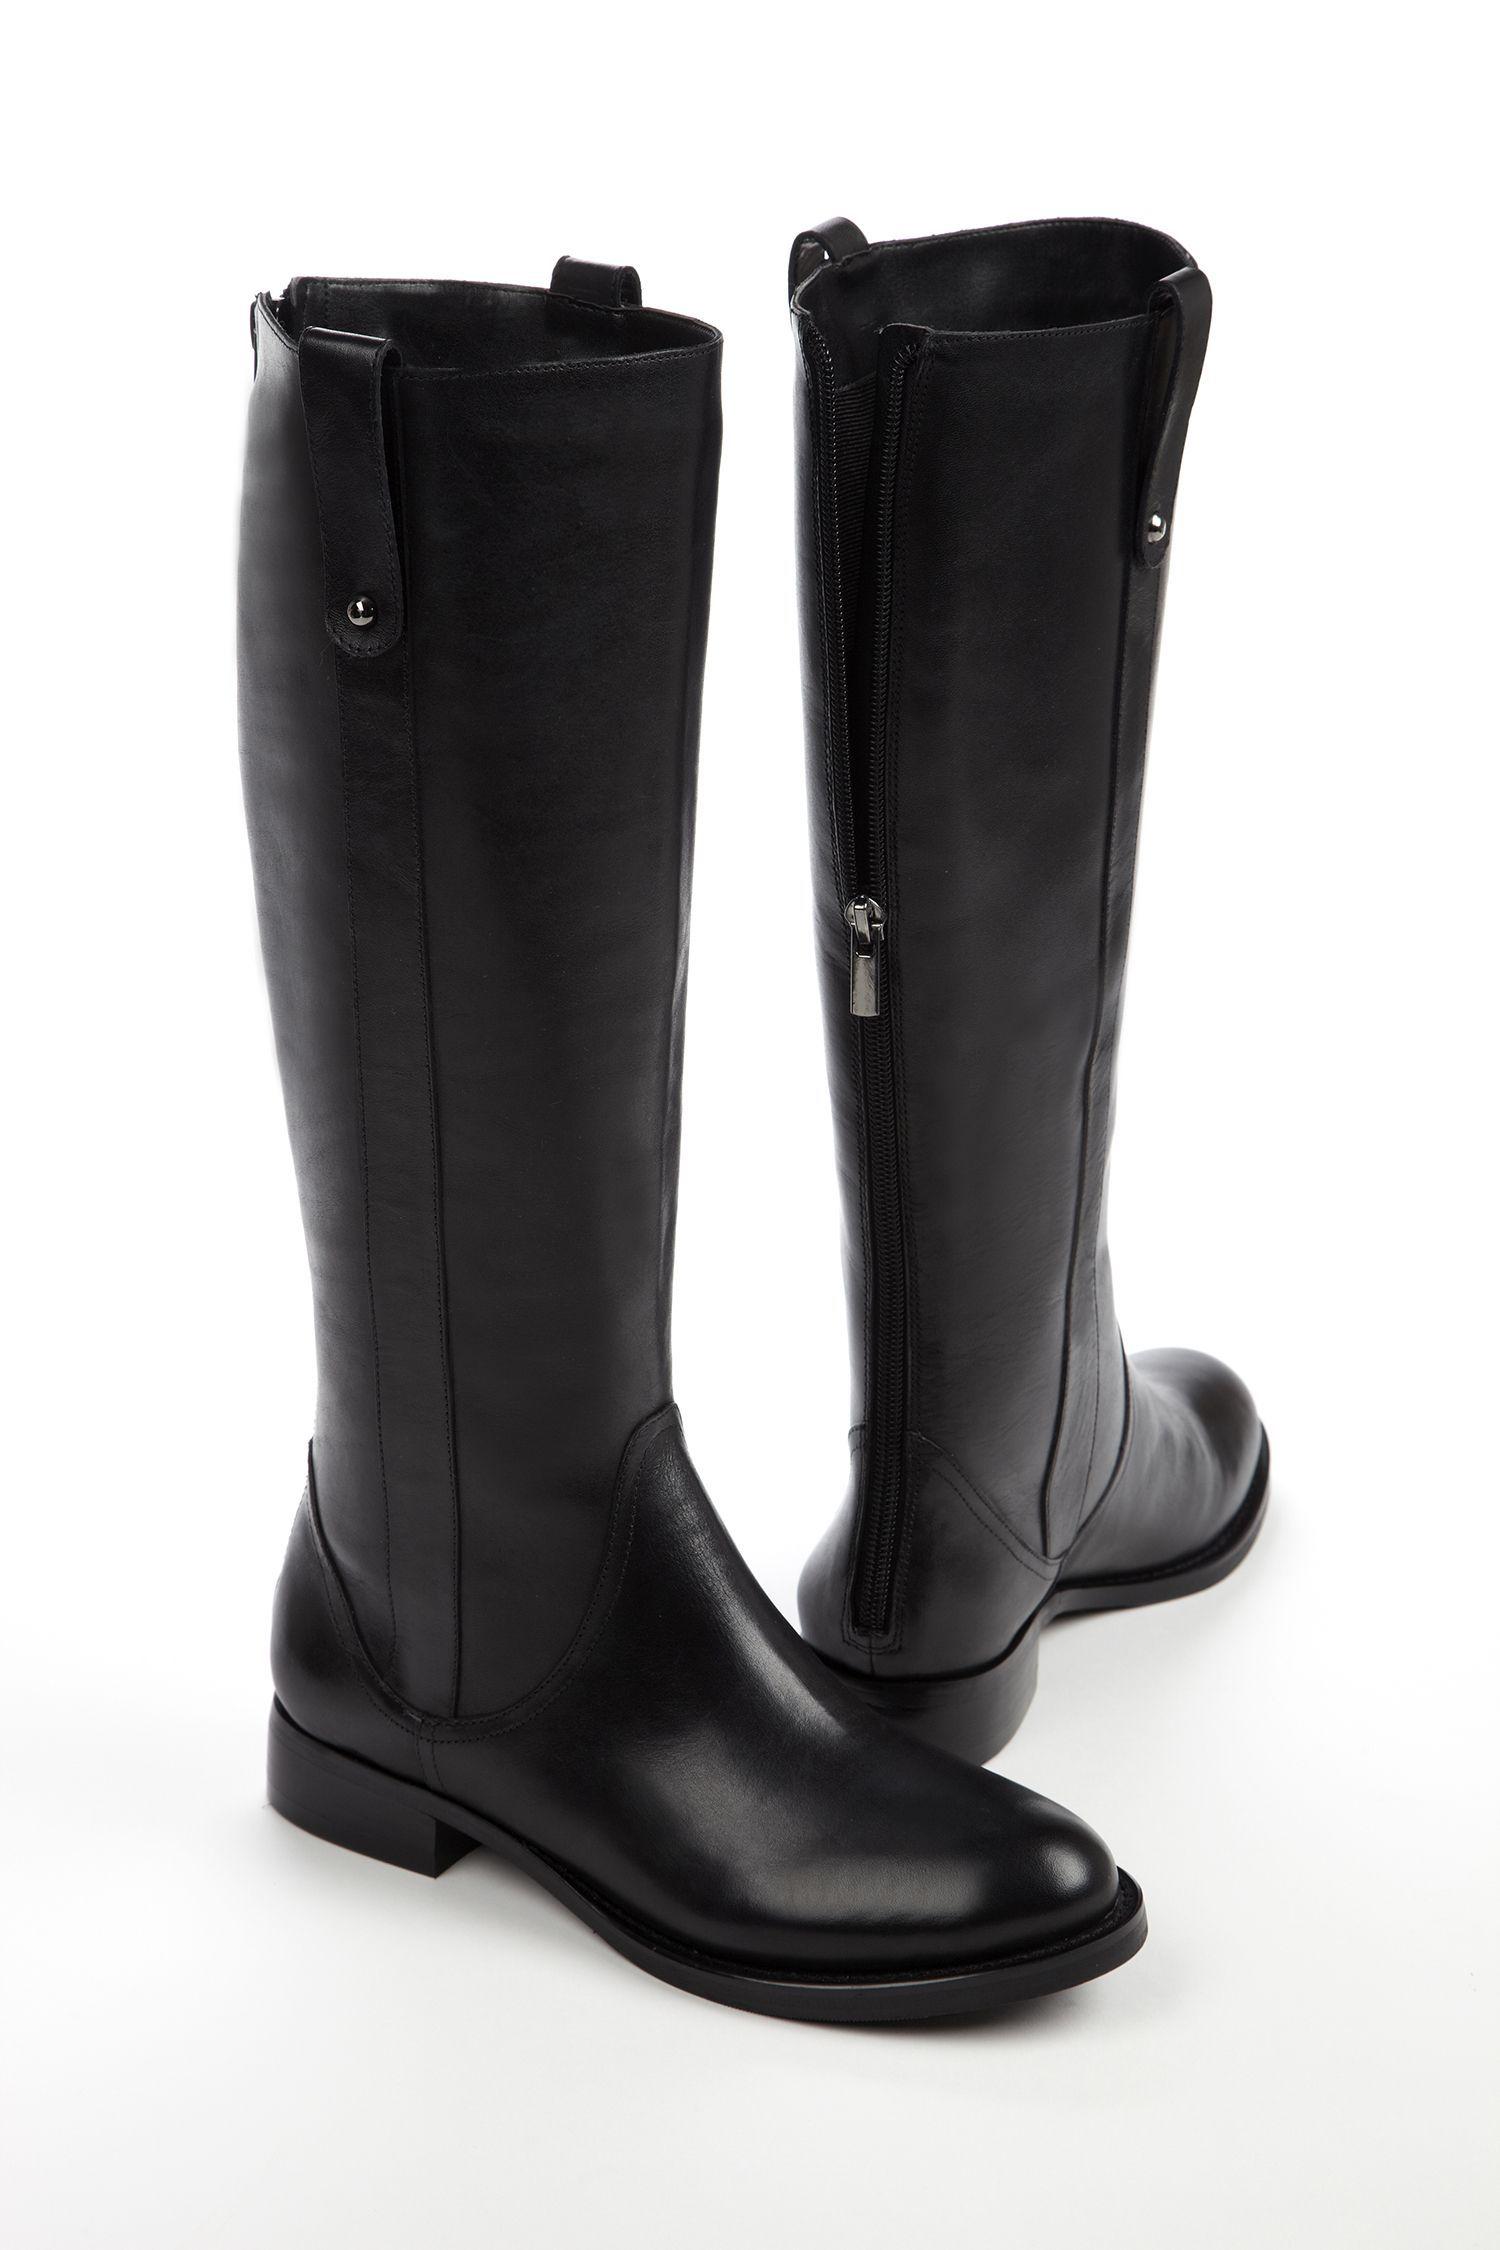 Tall Black Boots. in 2020 Μπότες ιππασίας, Μπότες, Παπούτσια